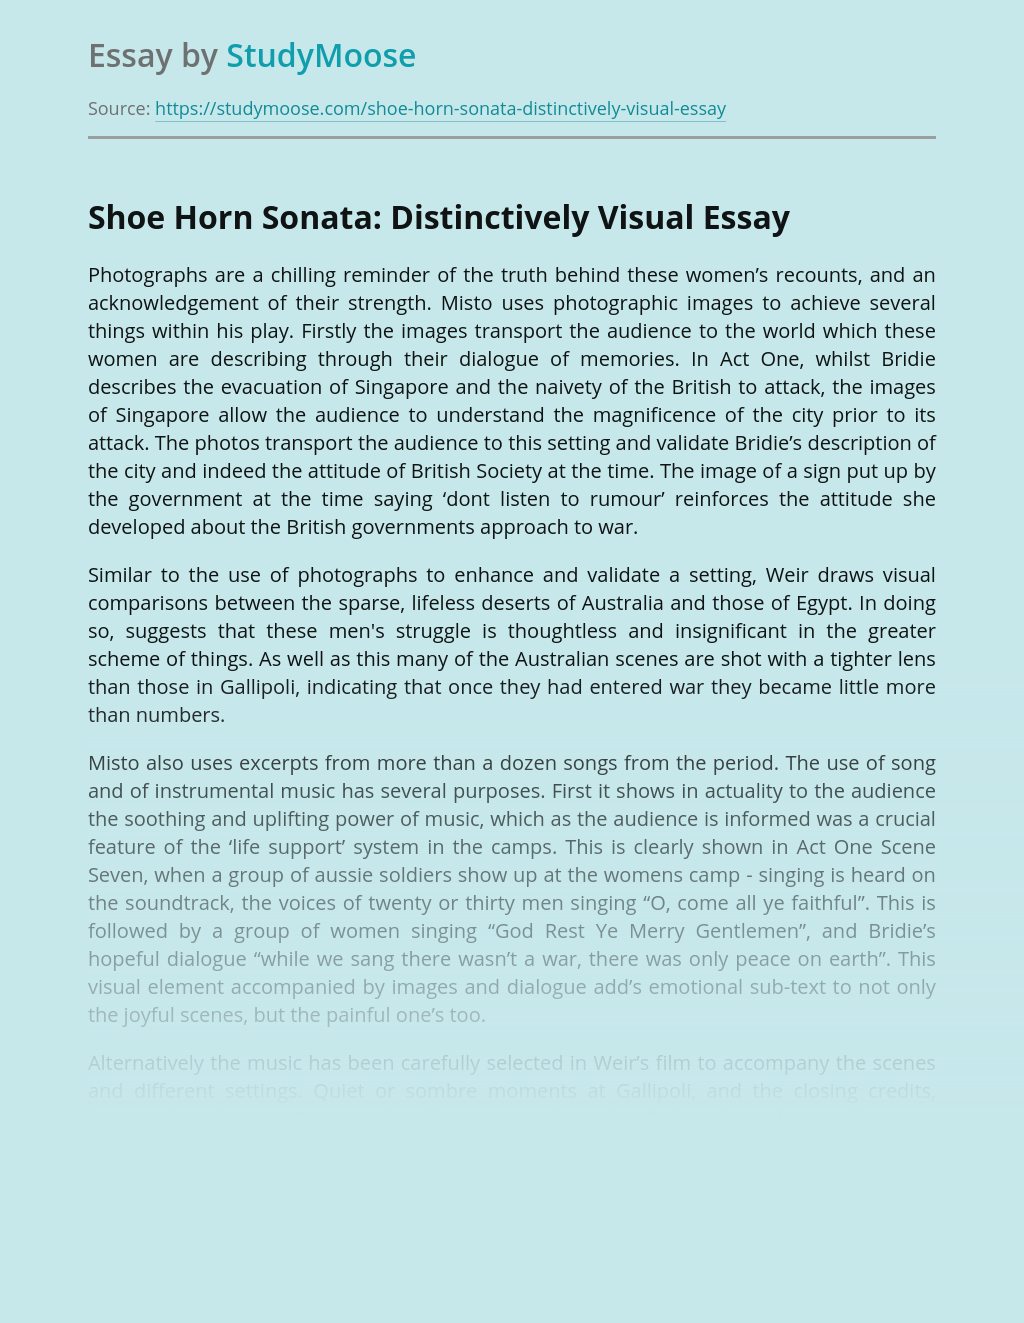 Shoe Horn Sonata: Distinctively Visual